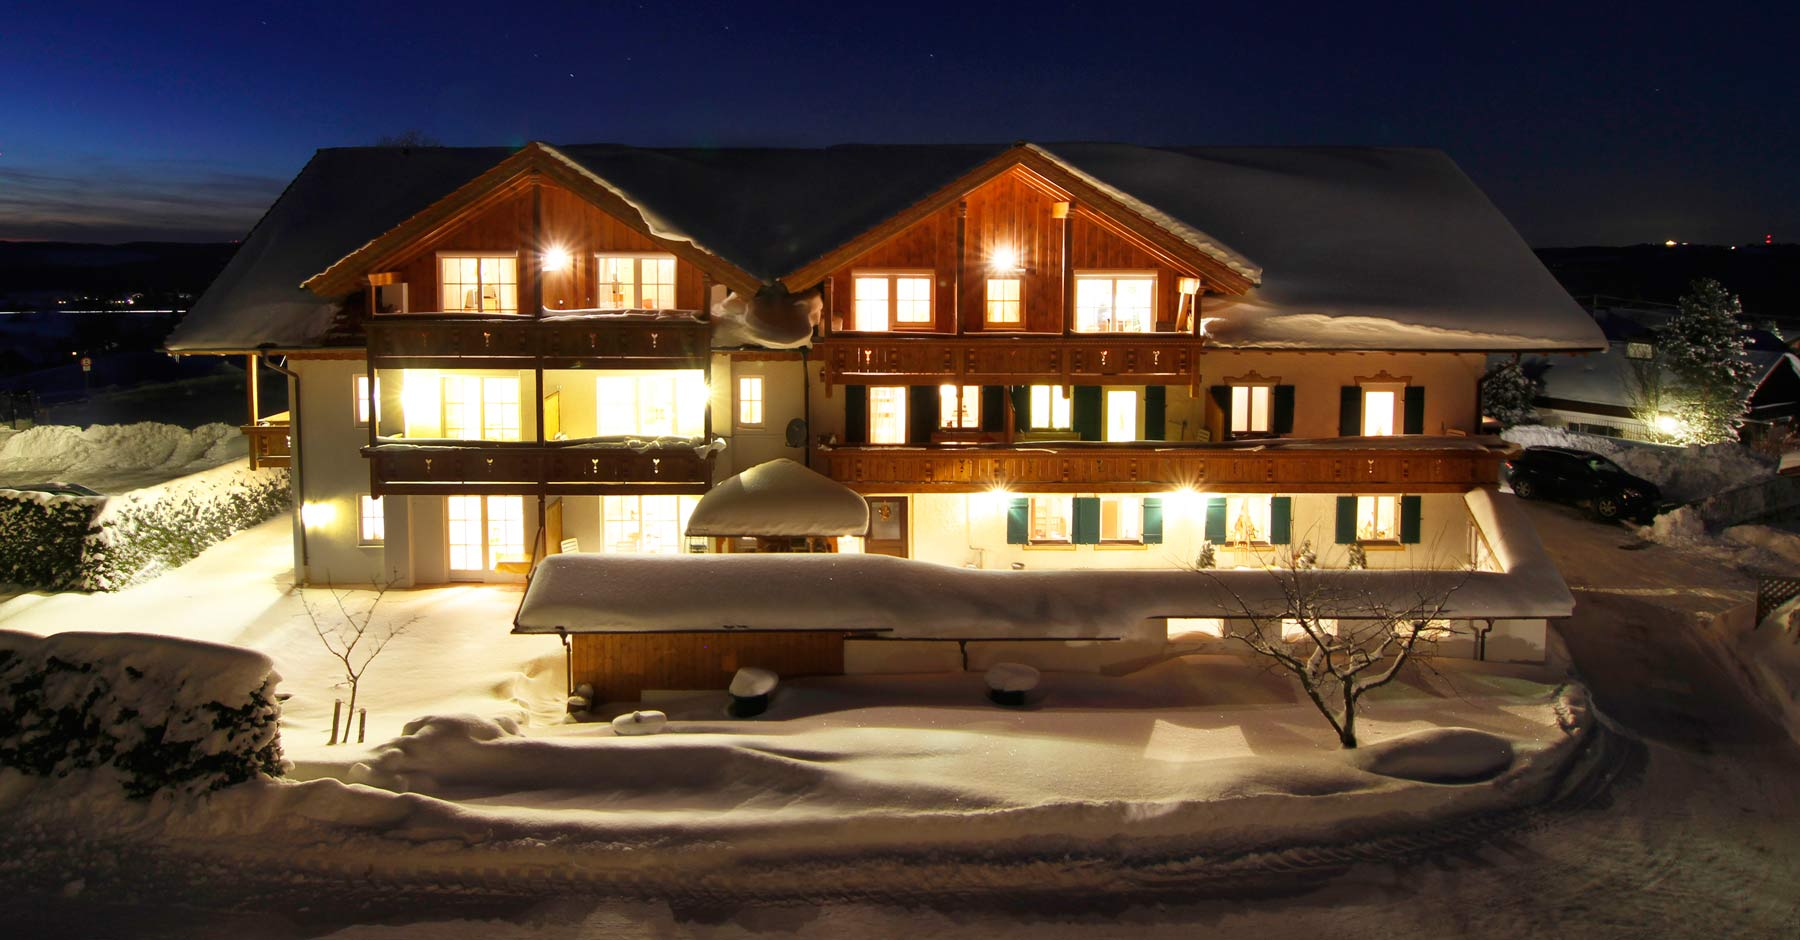 3 Sterne Superior Wellness Kurhotel Waldruh Bad Kohlgrub